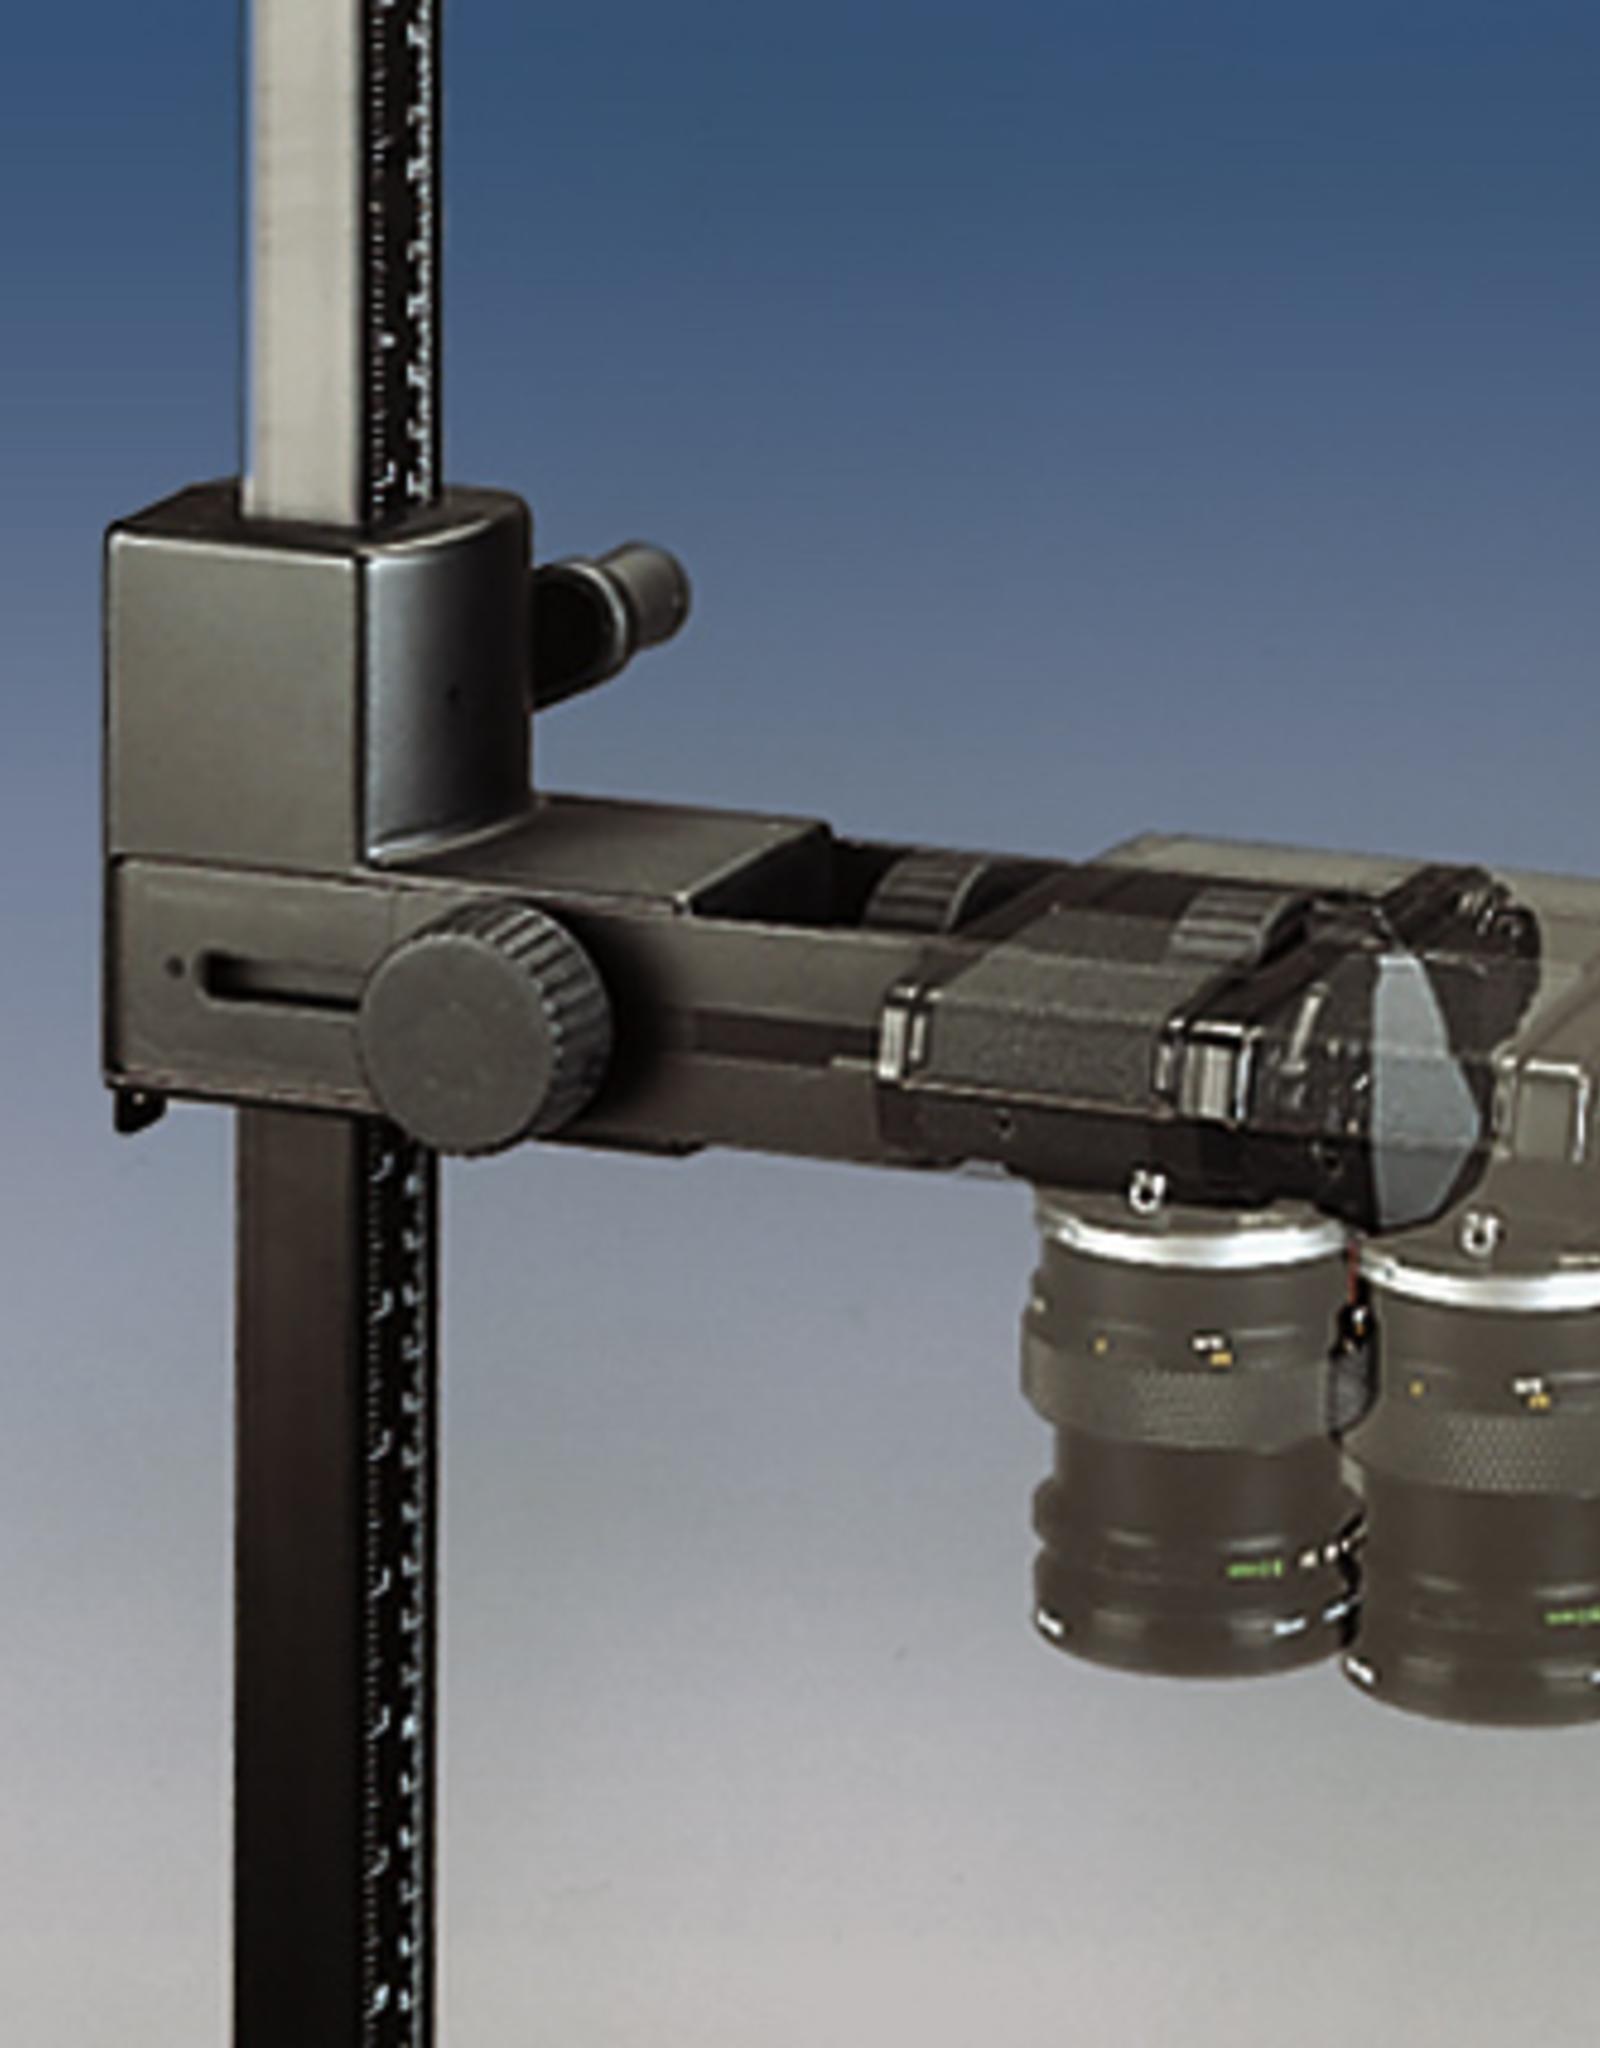 "Kaiser Kaiser Copy Stand RS 2 XA, camera holder horizontal adjustable, column height approx. 76 cm (29.9""), base board approx. 40 x 50 cm (15.7 x 19.7"")"